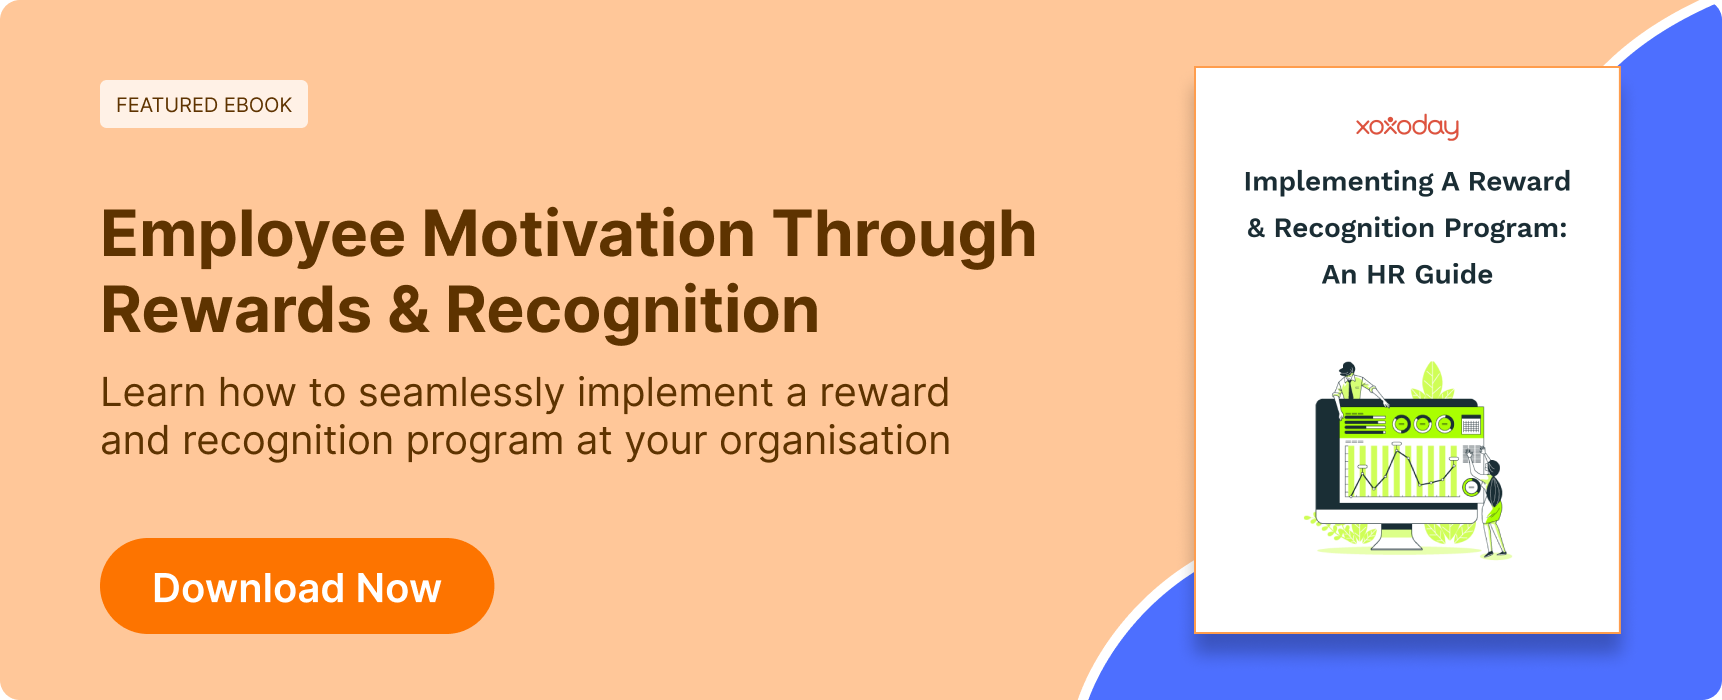 Implementing a reward & recognition program: An HR guide